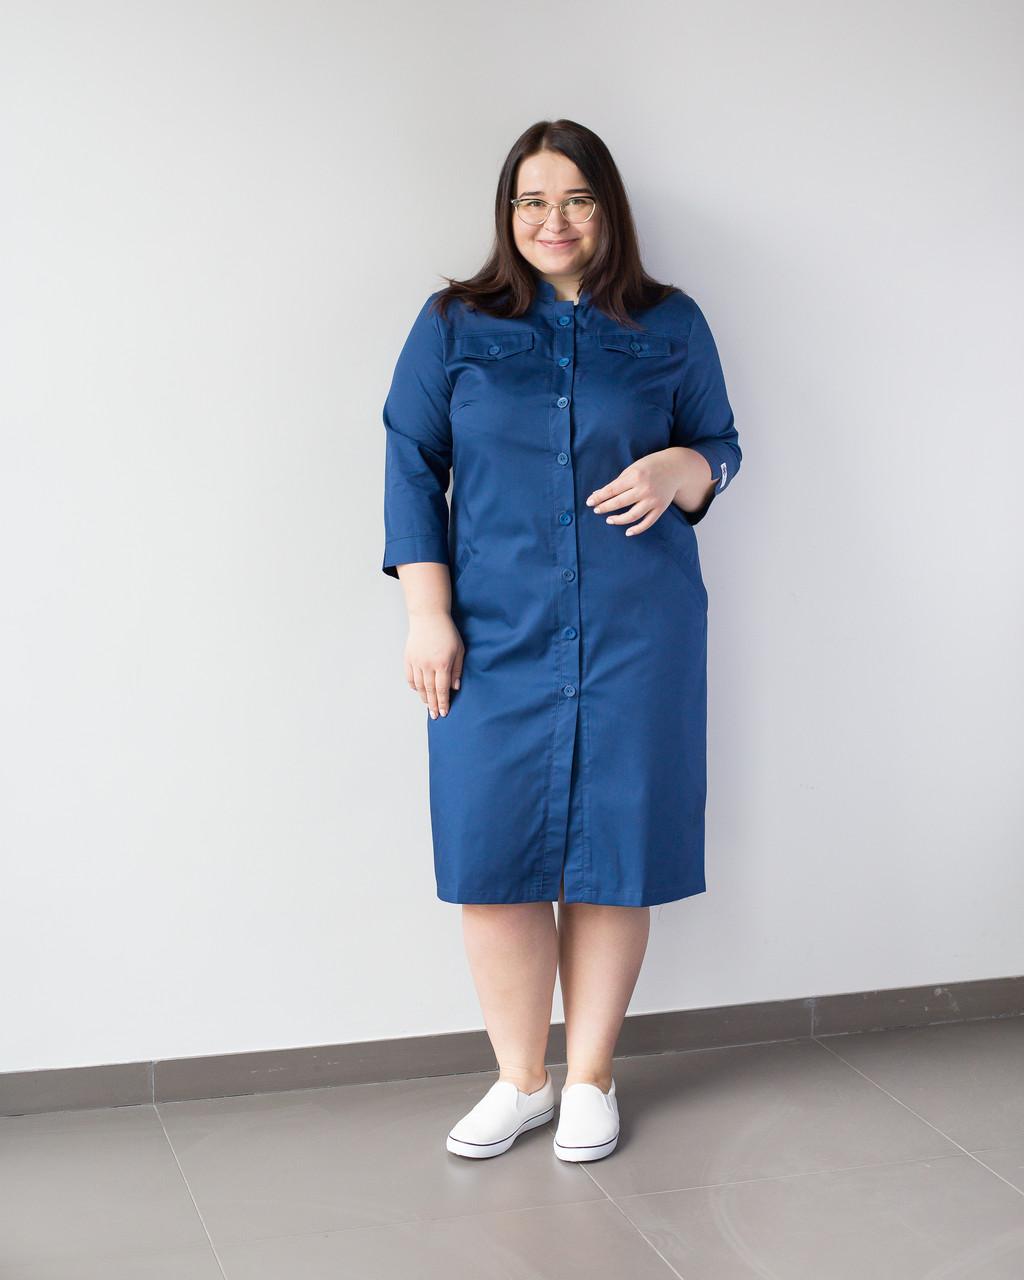 Медицинский женский халат Валери синий +SIZE